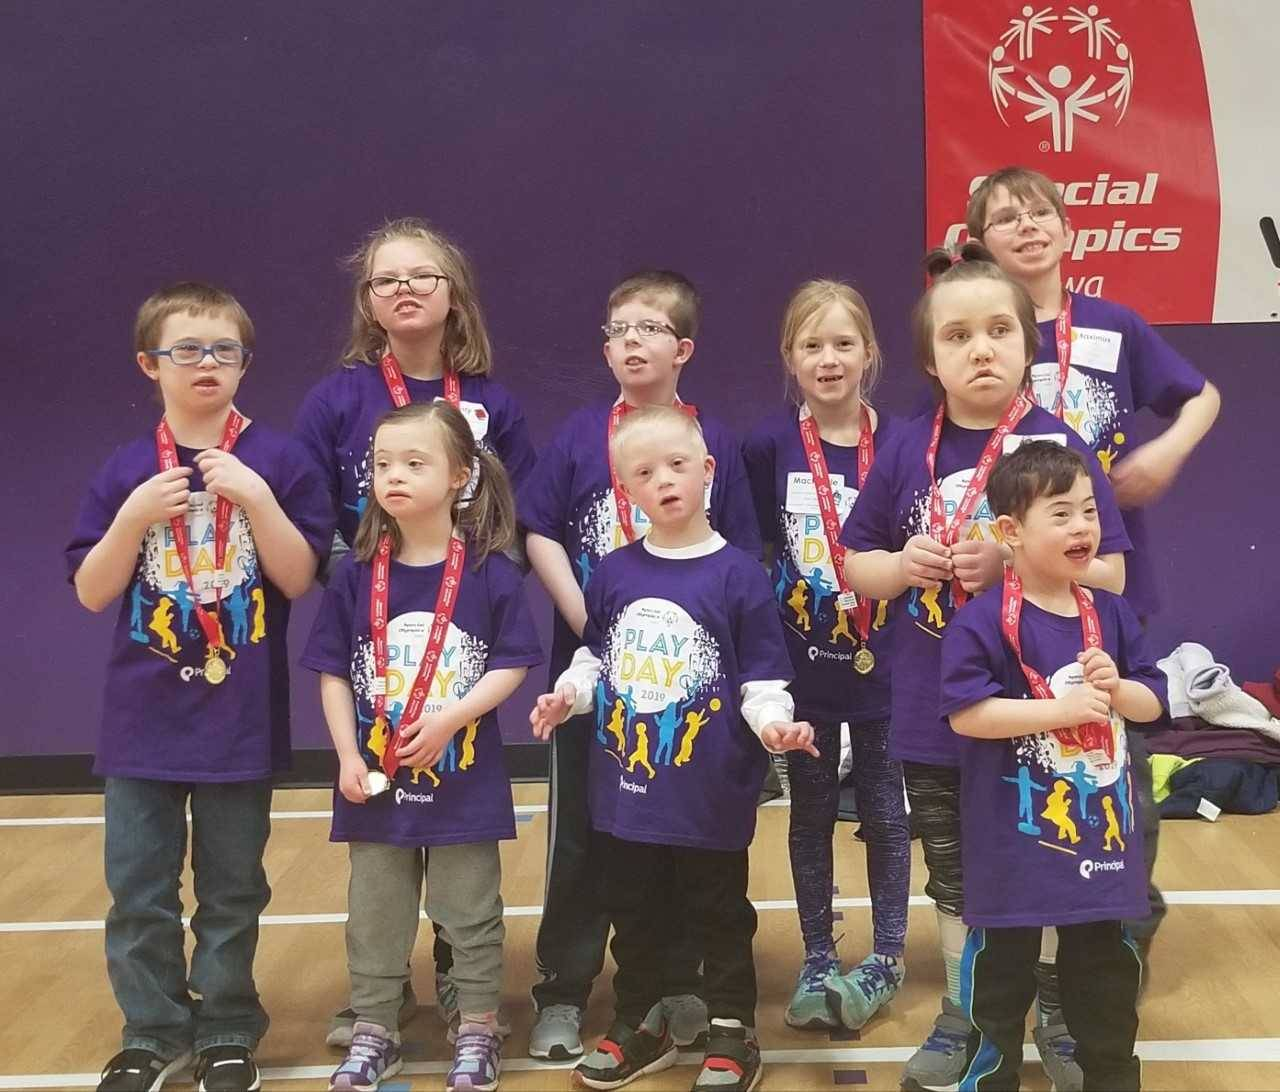 Special Olympics Contestants